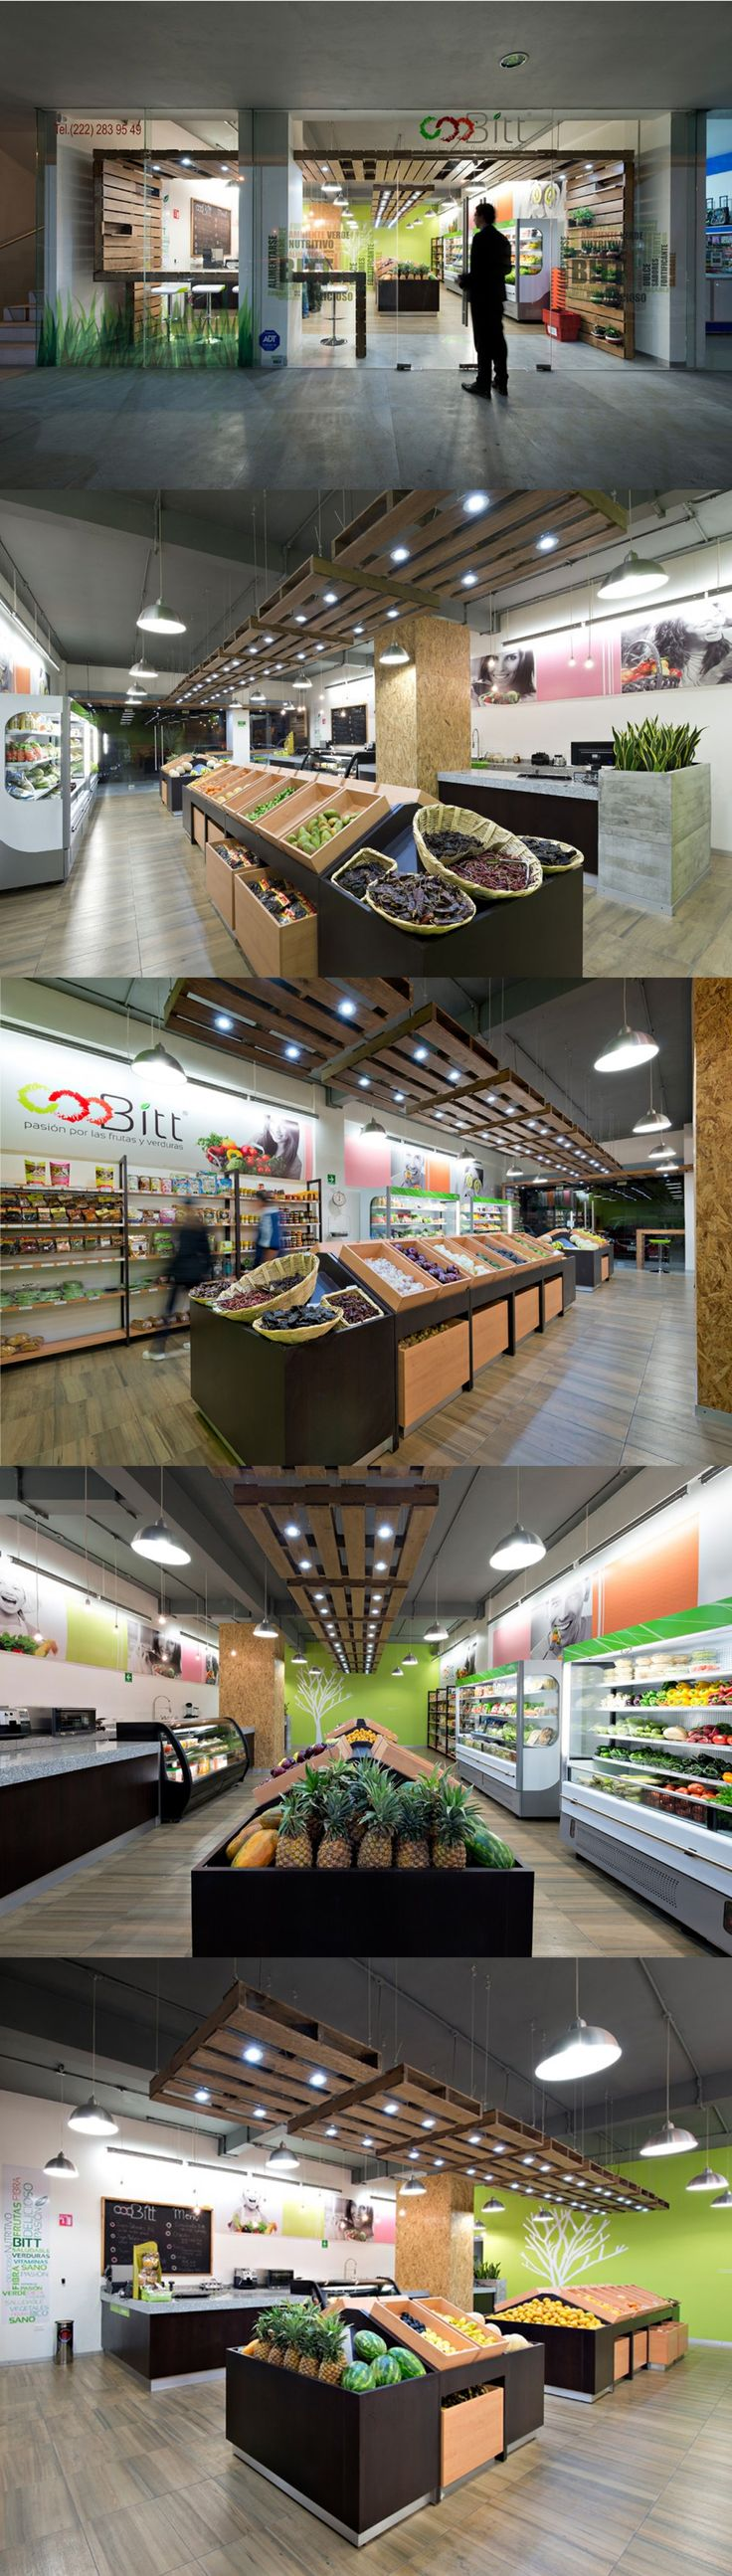 Bitt Supermarket